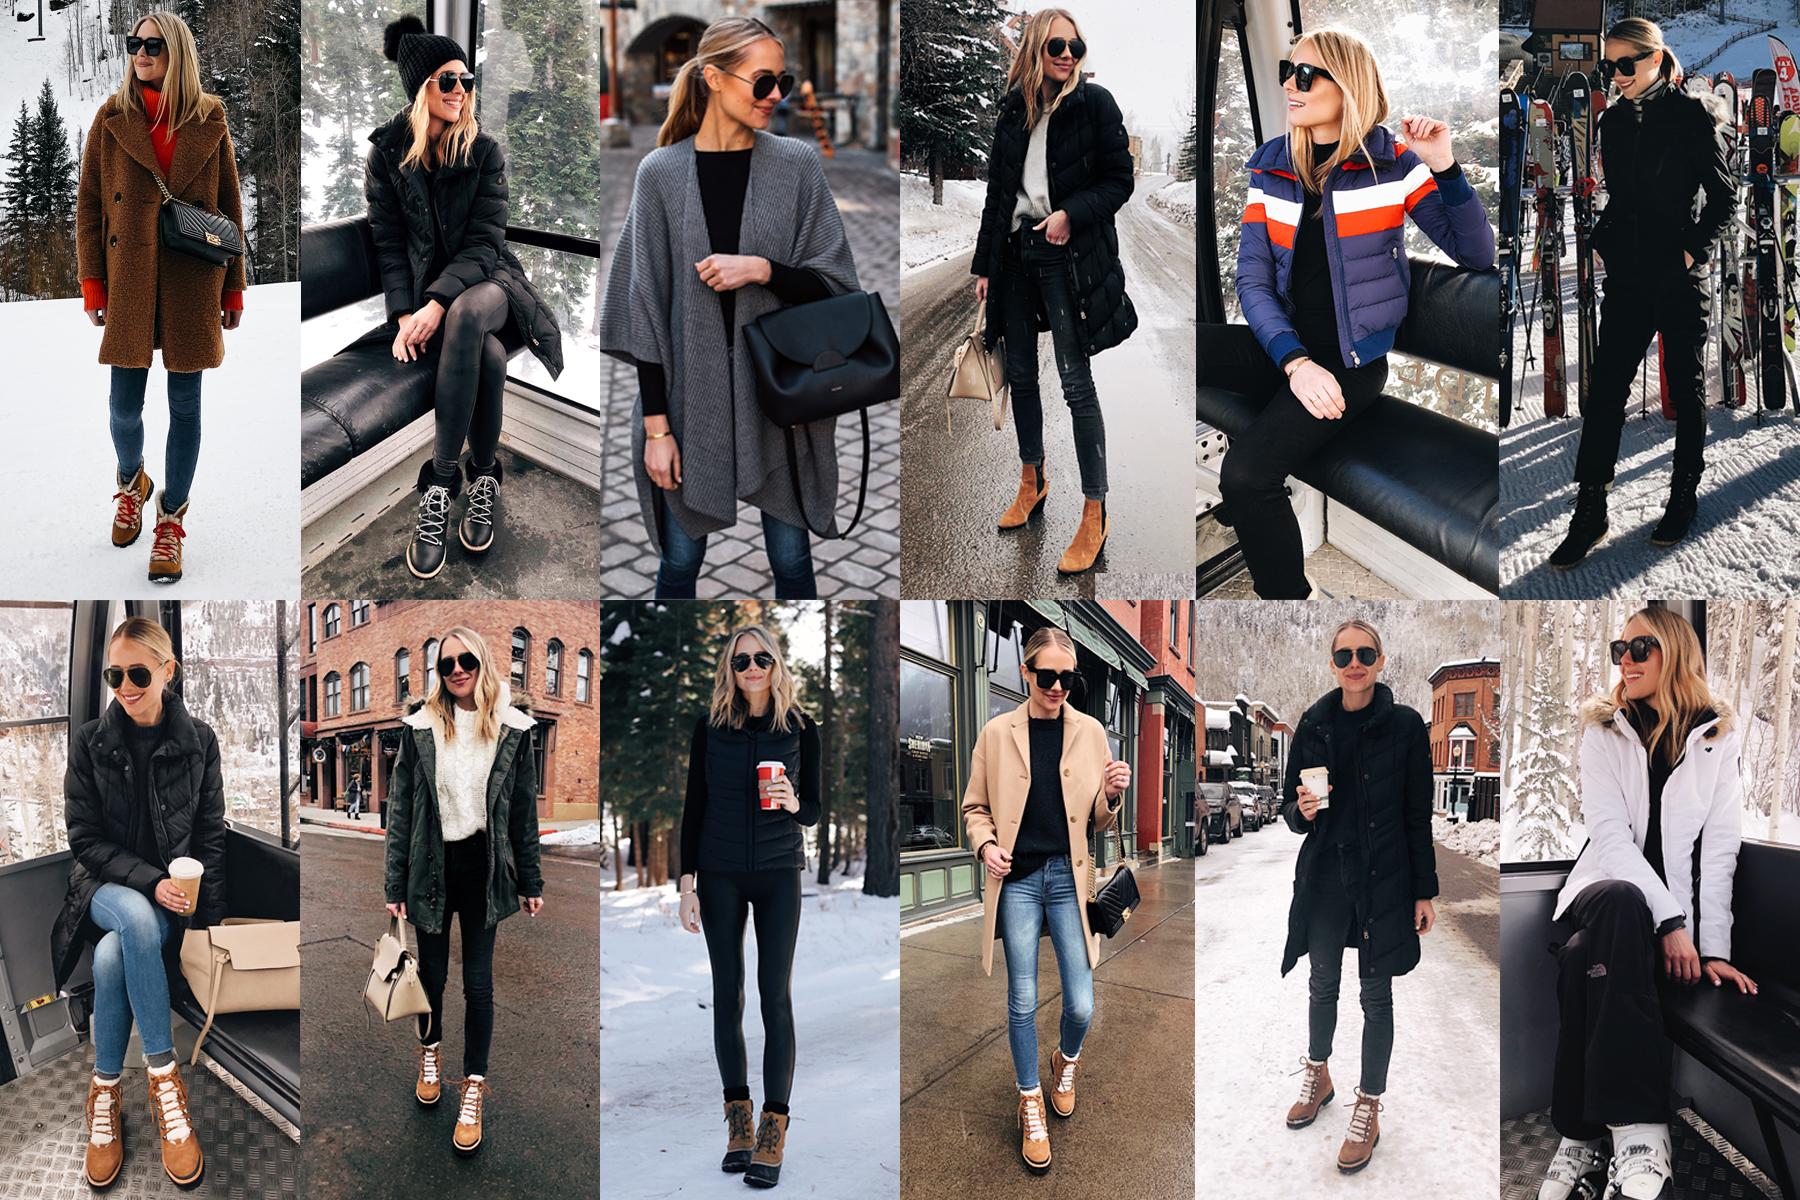 Fashion Jackson Winter Ski Trip Outfits